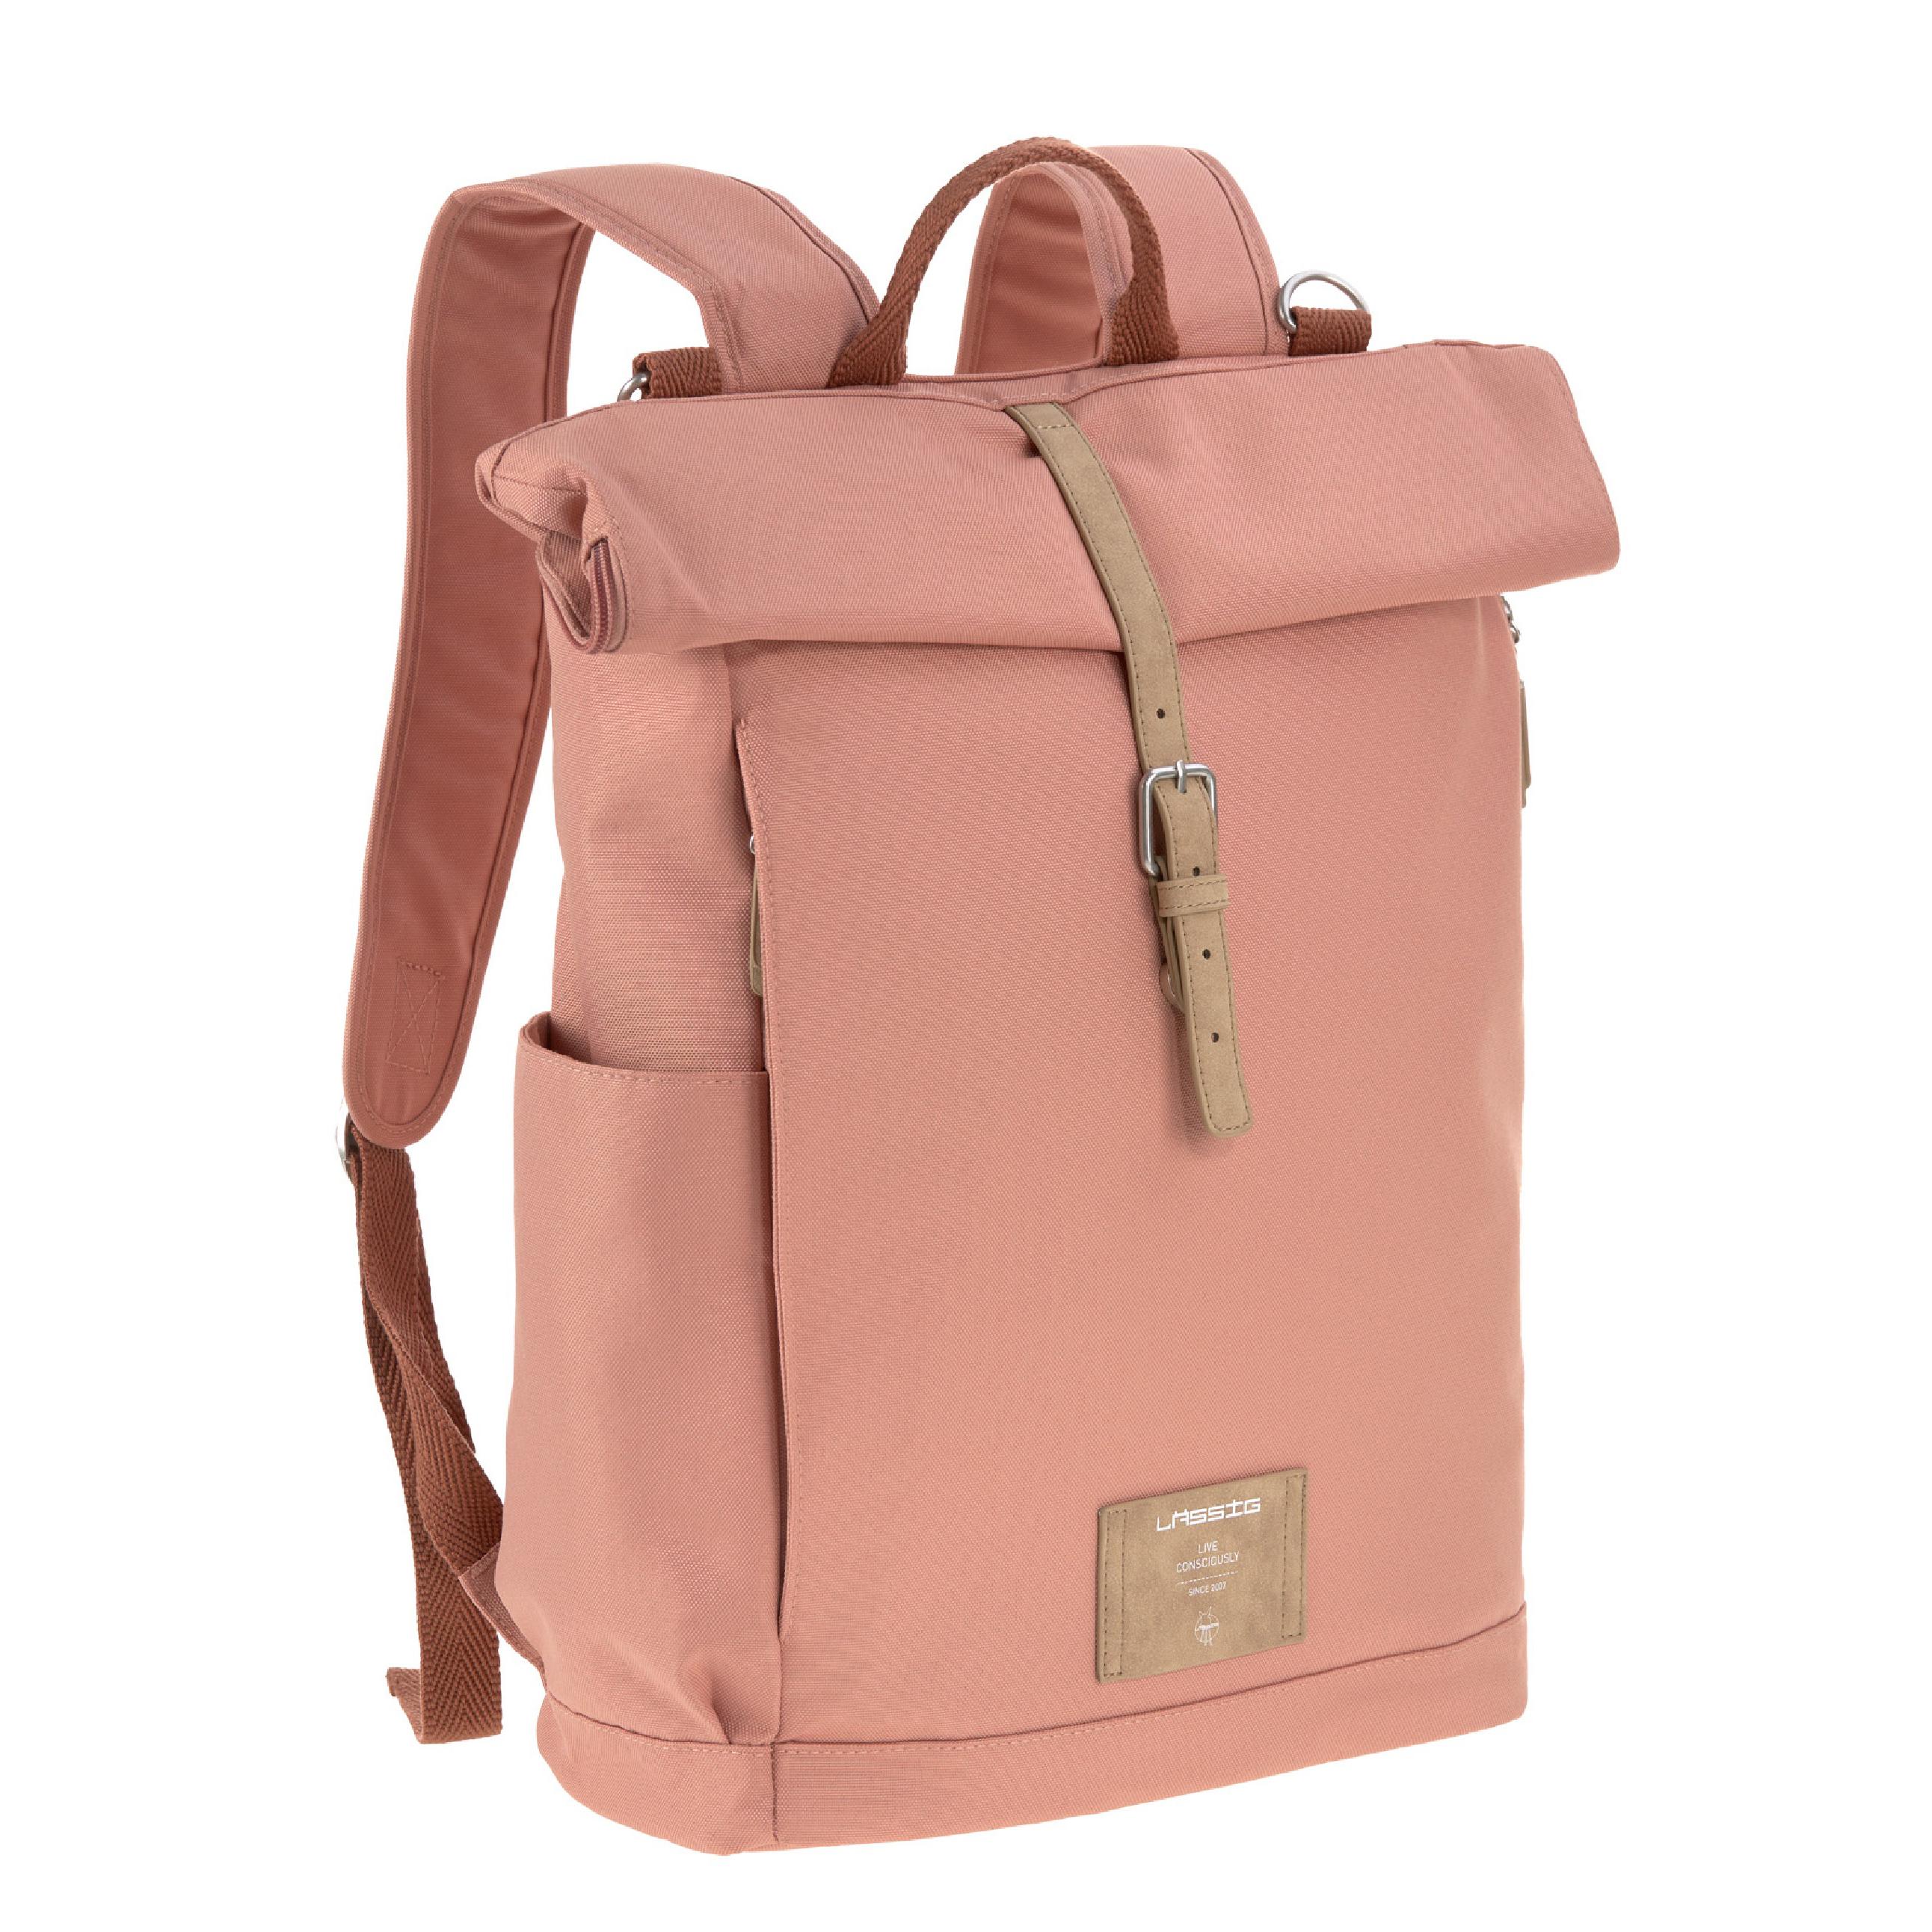 Wickelrucksack - Rolltop Backpack - Cinnamon - Lässig